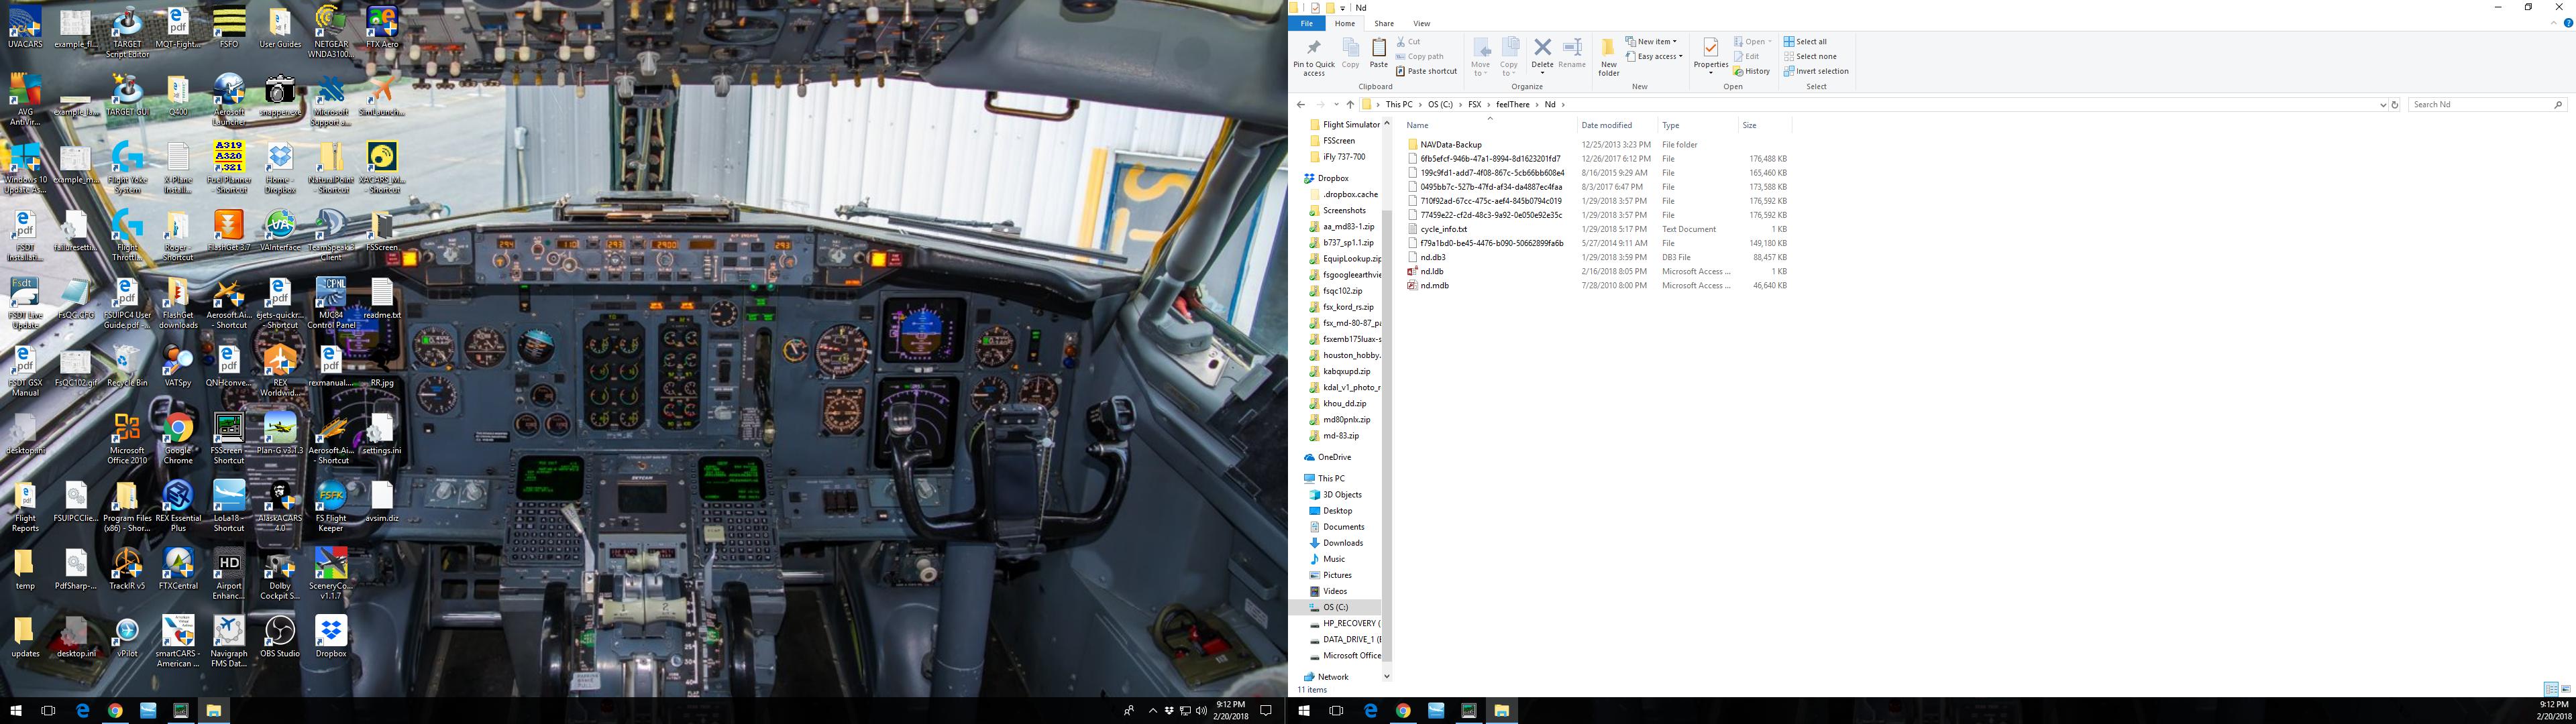 ERJ175 Nav Database Load Issue - Airplanes - The simFlight Network